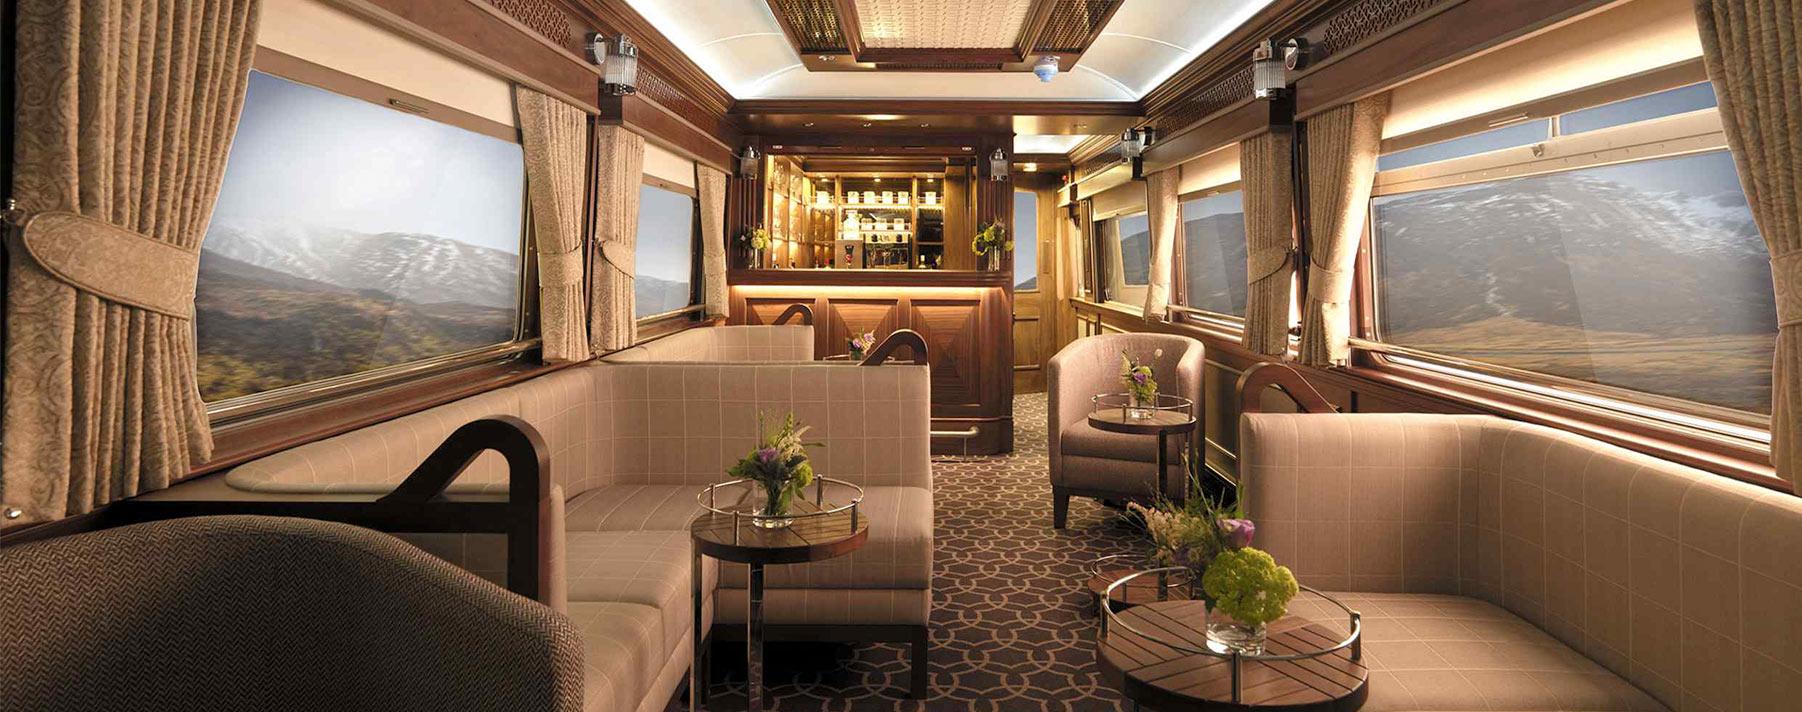 Los elegantes vagones del Belmond Grand Hibernian están inspirados en la arquitectura georgiana de Dublín.